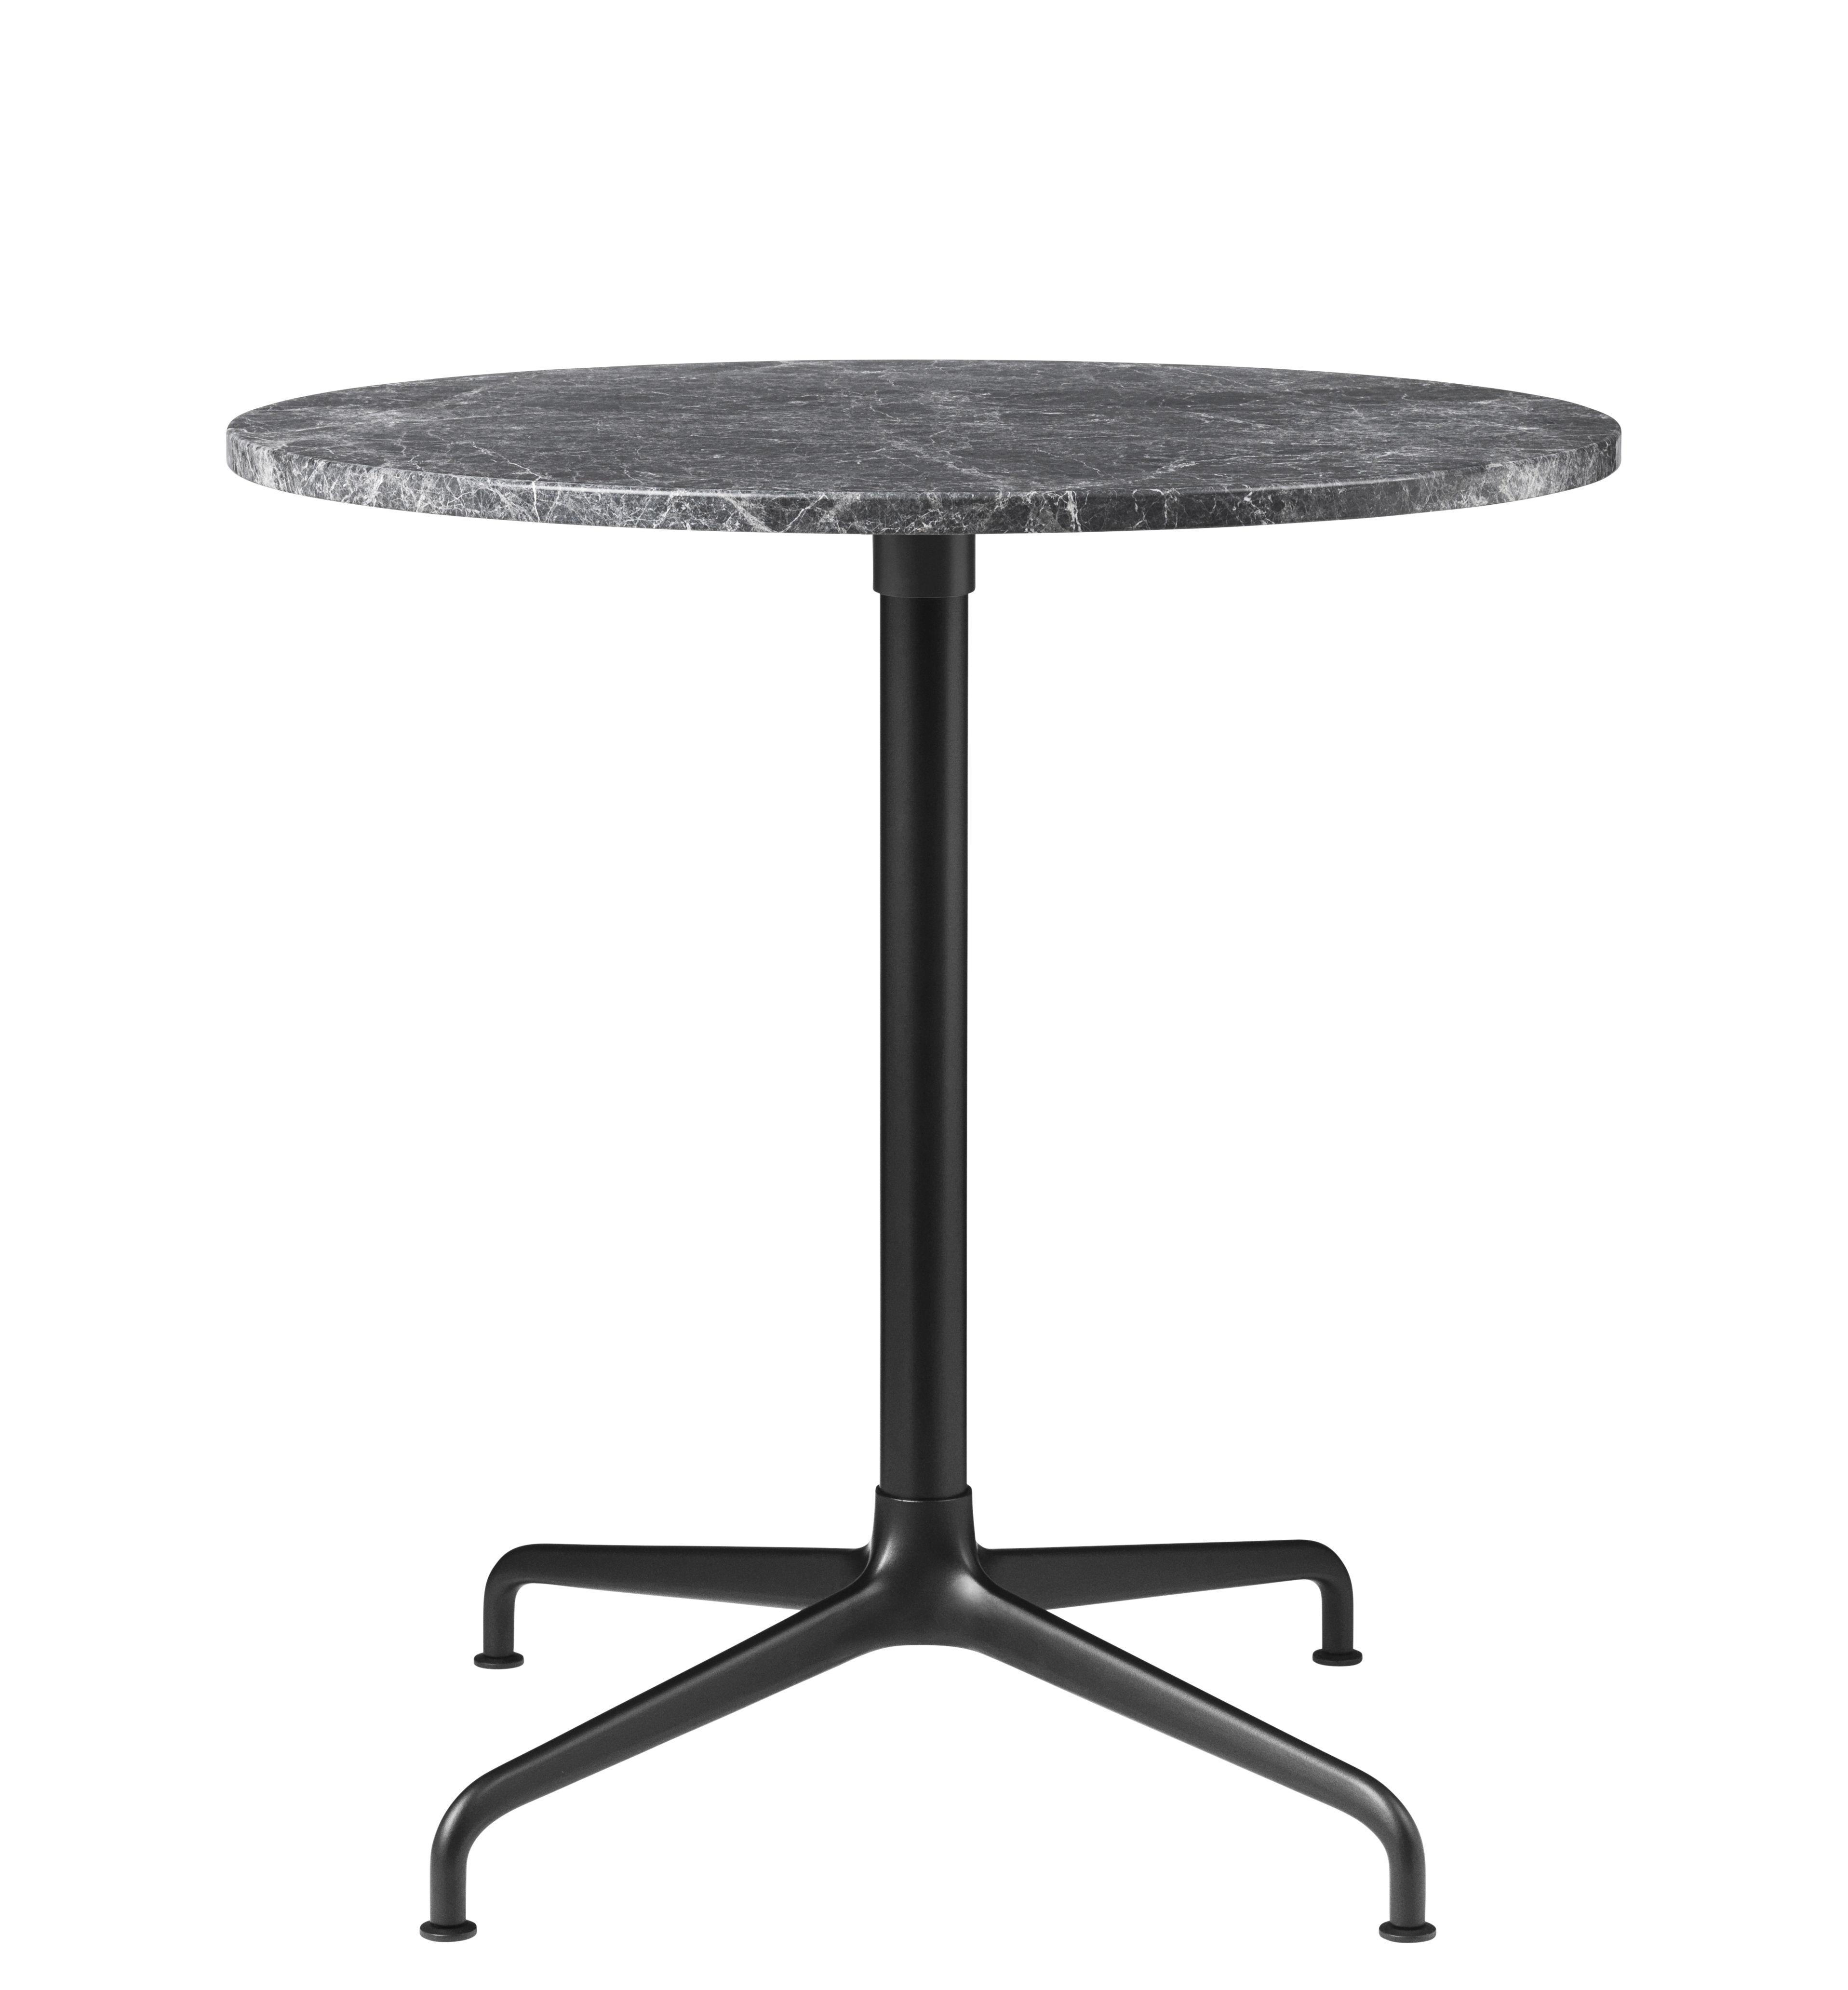 Mobilier - Tables - Table ronde Beetle / Gamfratesi - Ø 70 cm - Gubi - Marbre gris / Pied noir & alu - Aluminium laqué, Aluminium poli, Marbre